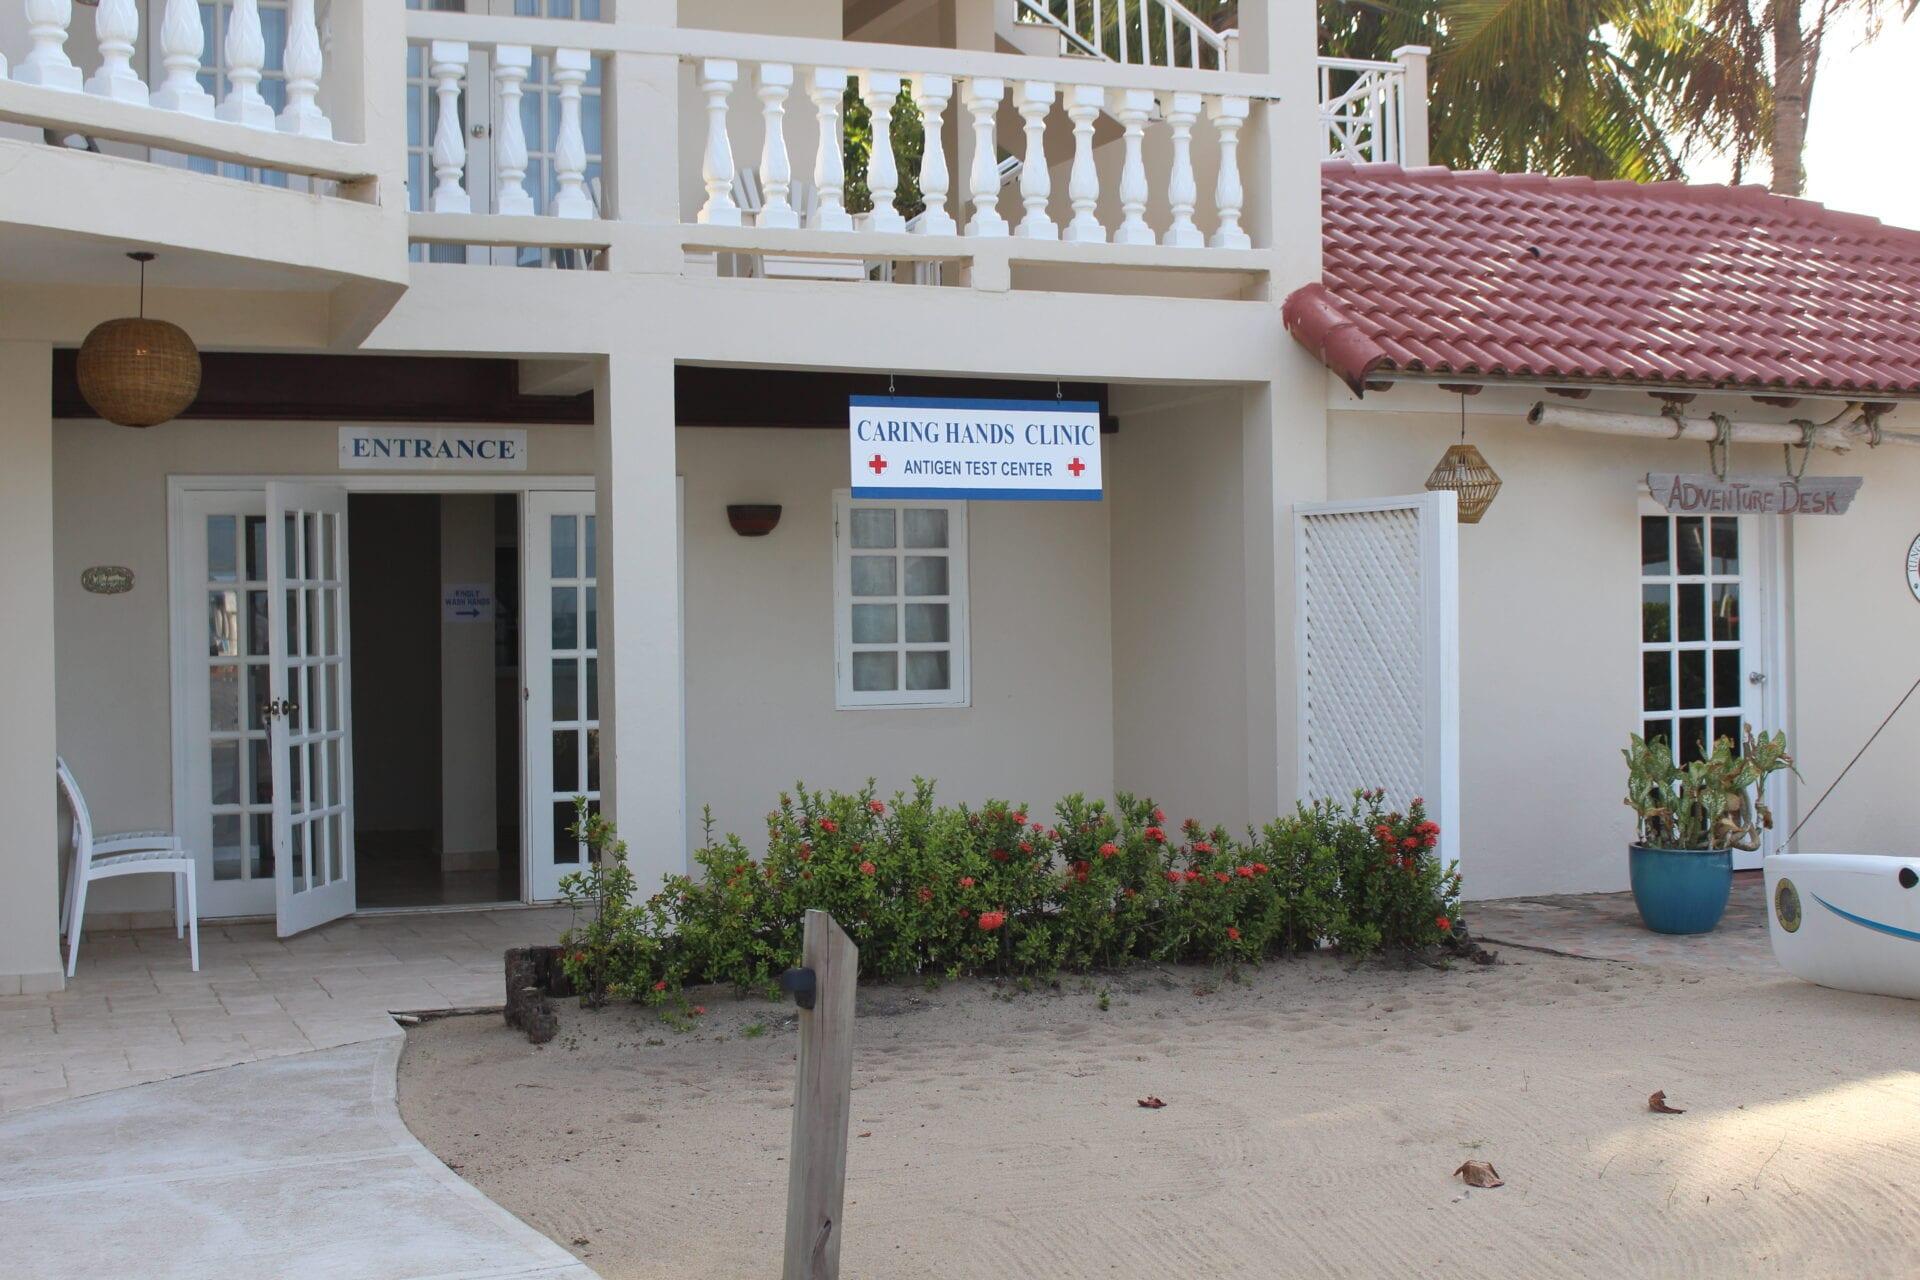 caring hands clinic lodge jaguar reef belize